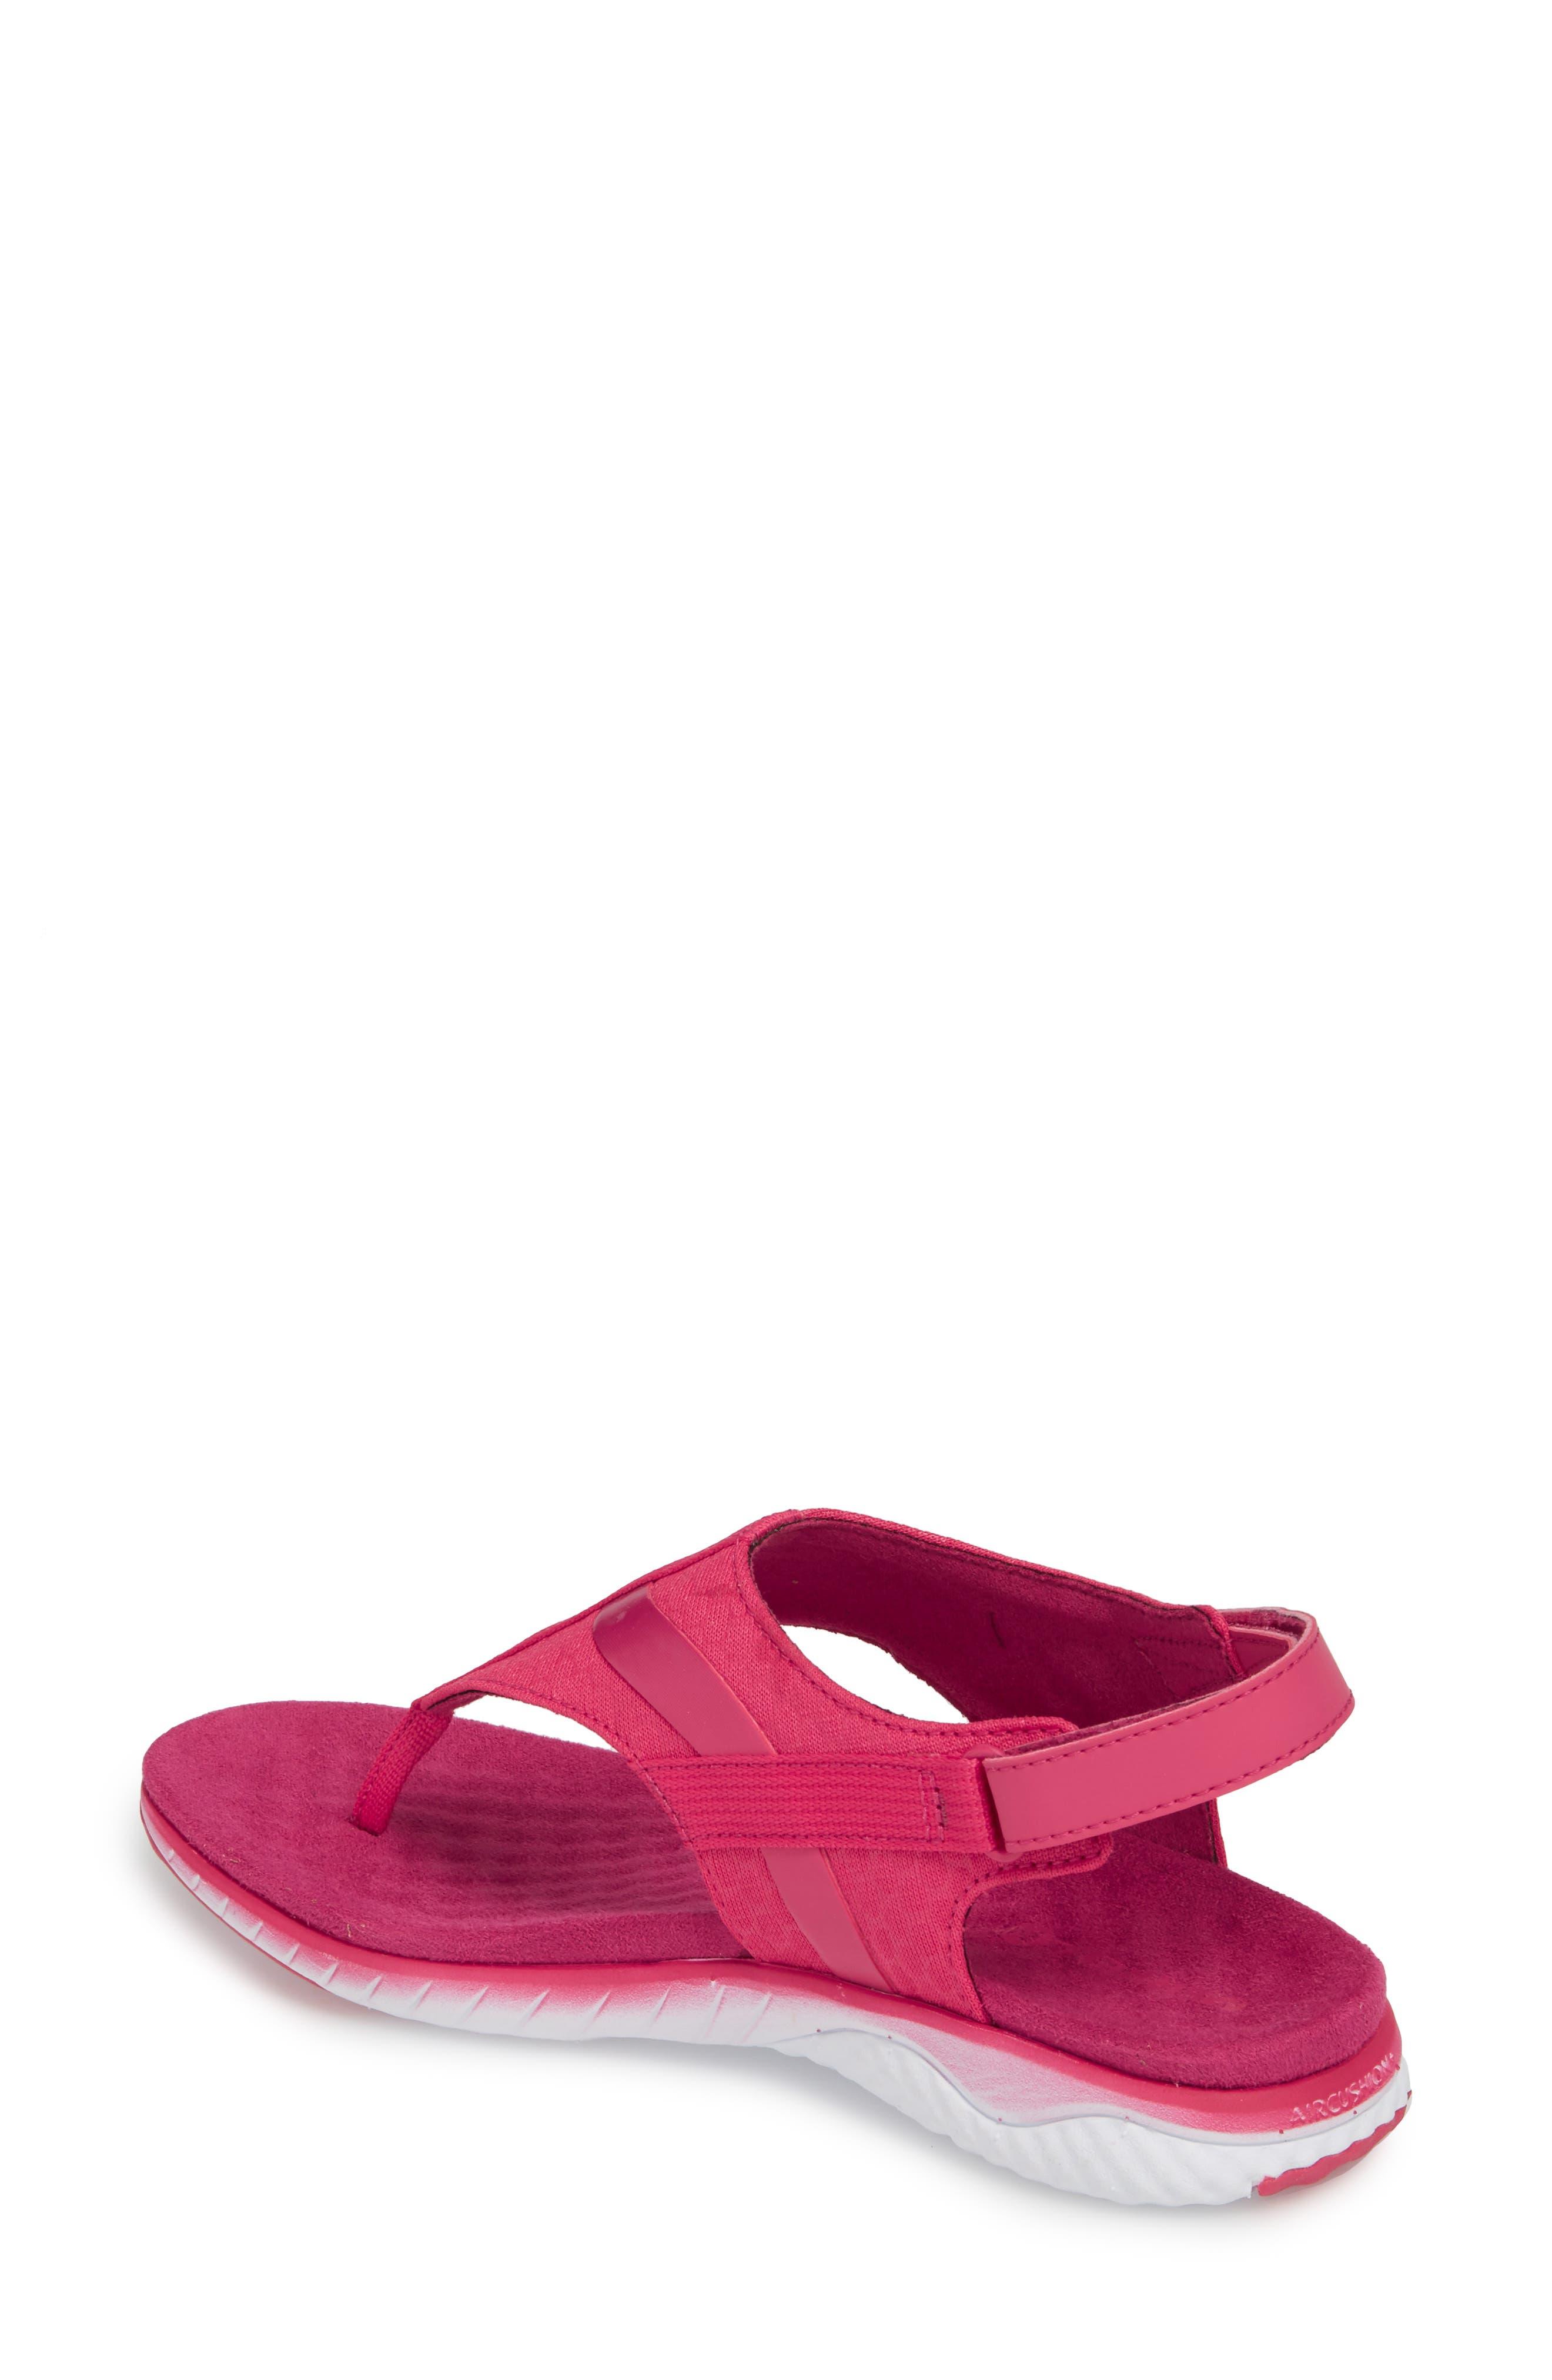 1SIX8 Linna Slide Air Cushion+ Sandal,                             Alternate thumbnail 8, color,